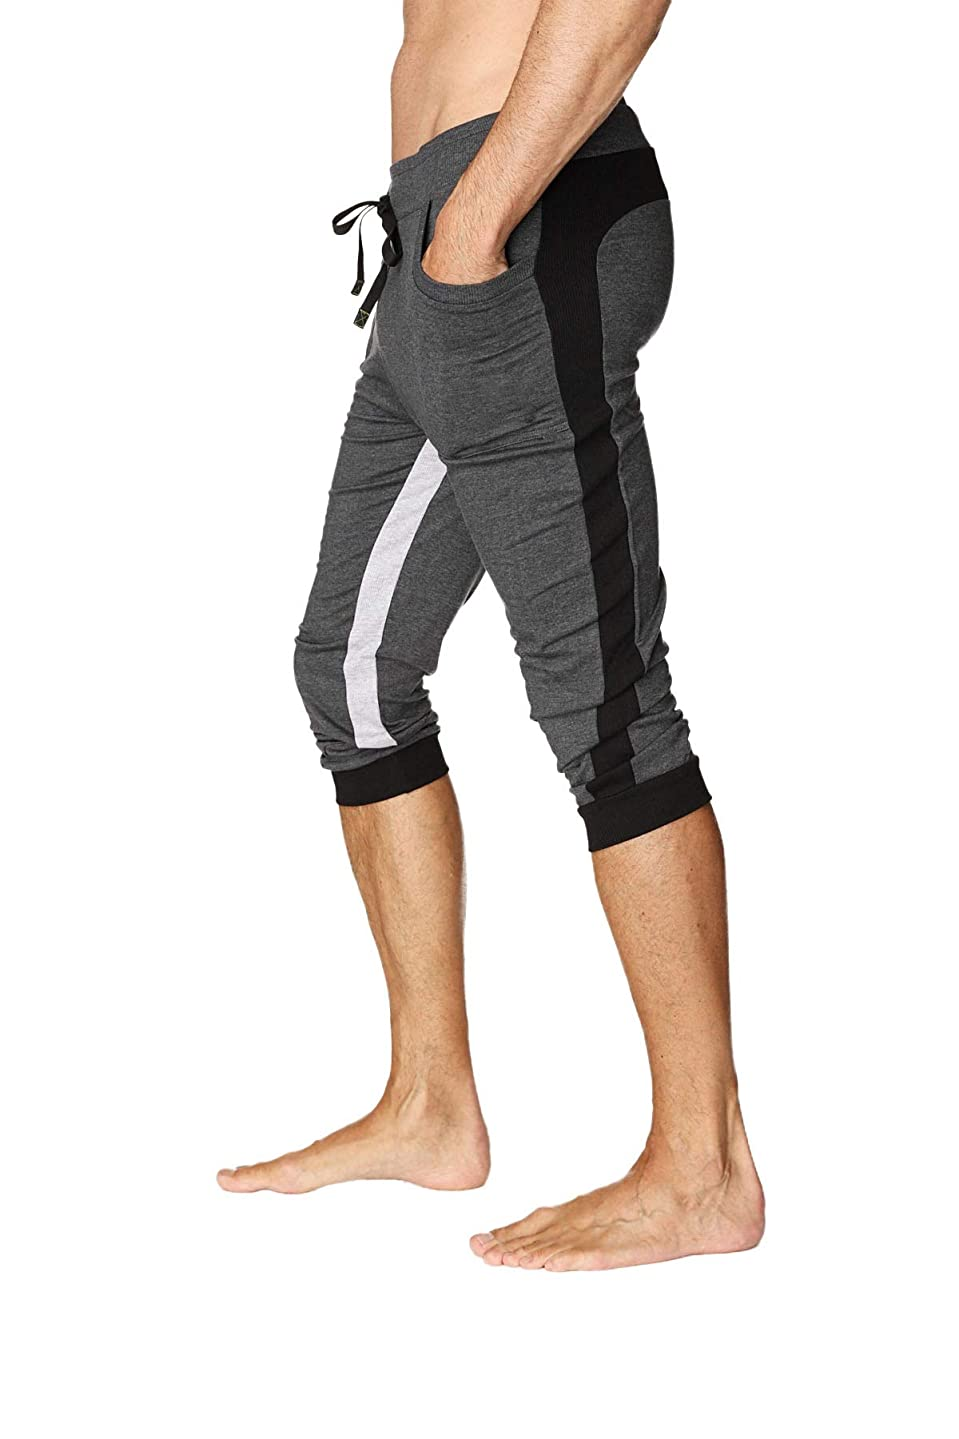 4-rth Men's Ultra-Flex Tri-Color Cuffed Yoga Pant